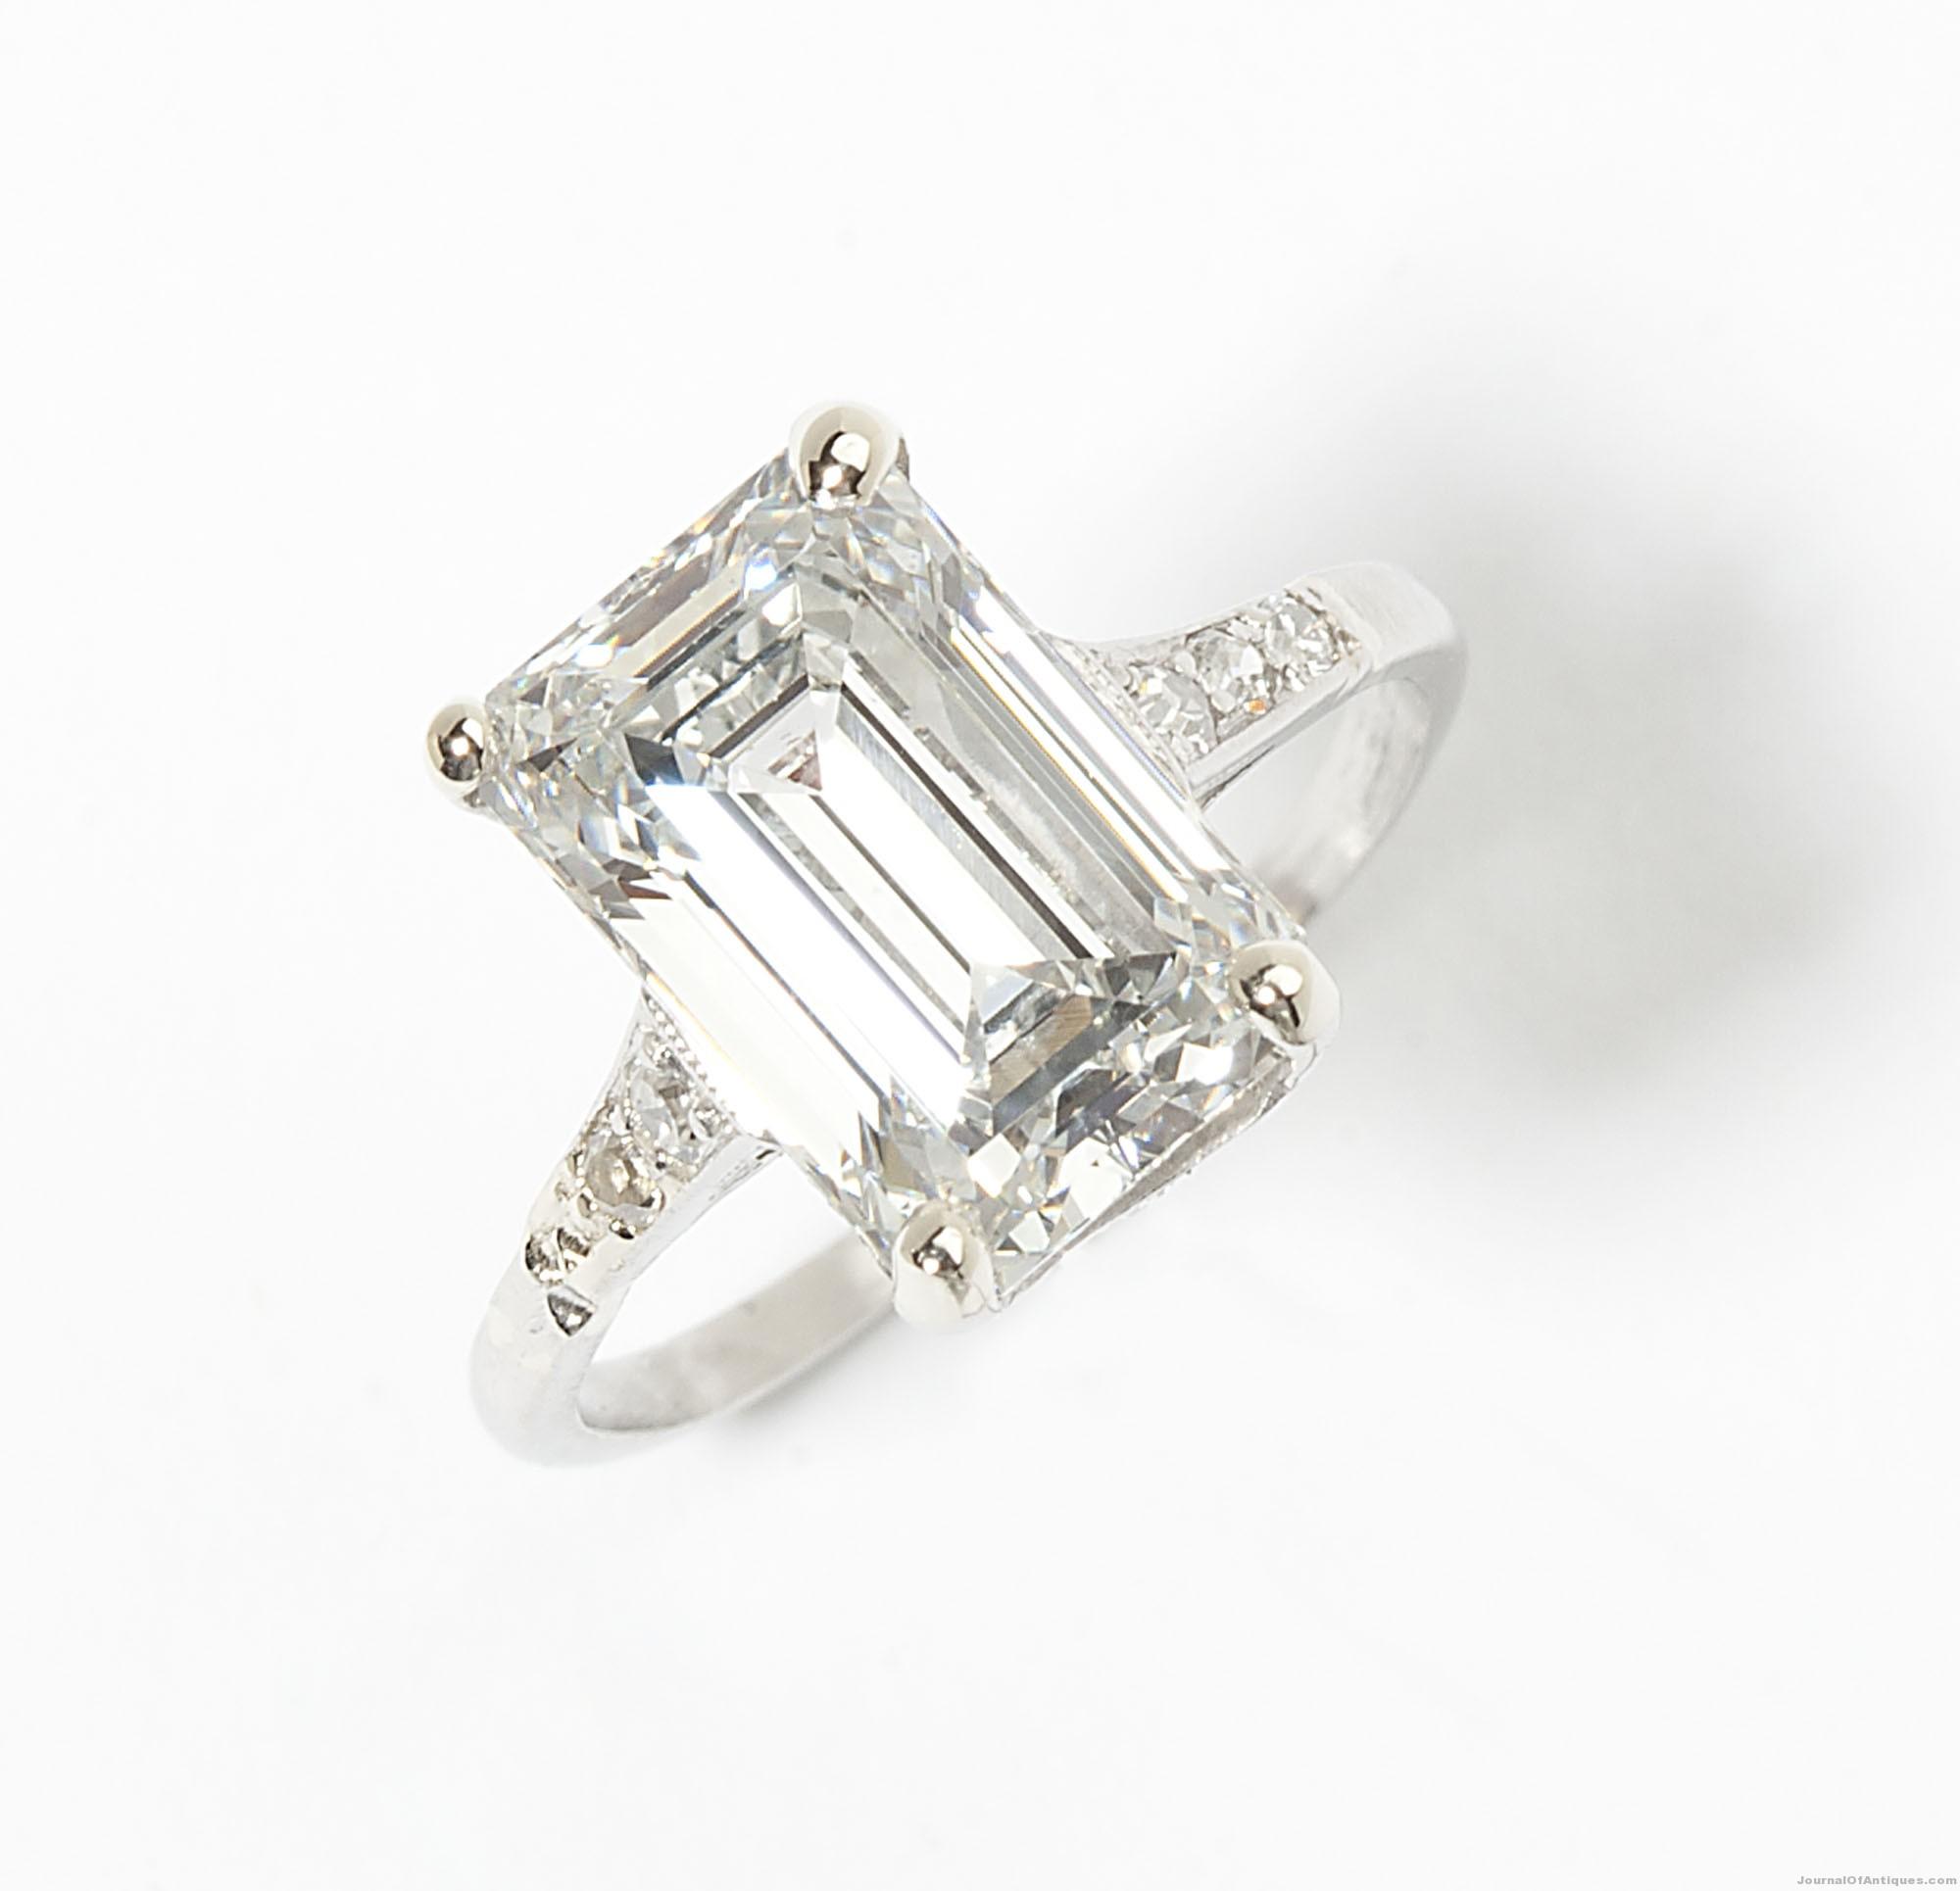 3.23-carat diamond ring, $33,600, John Moran